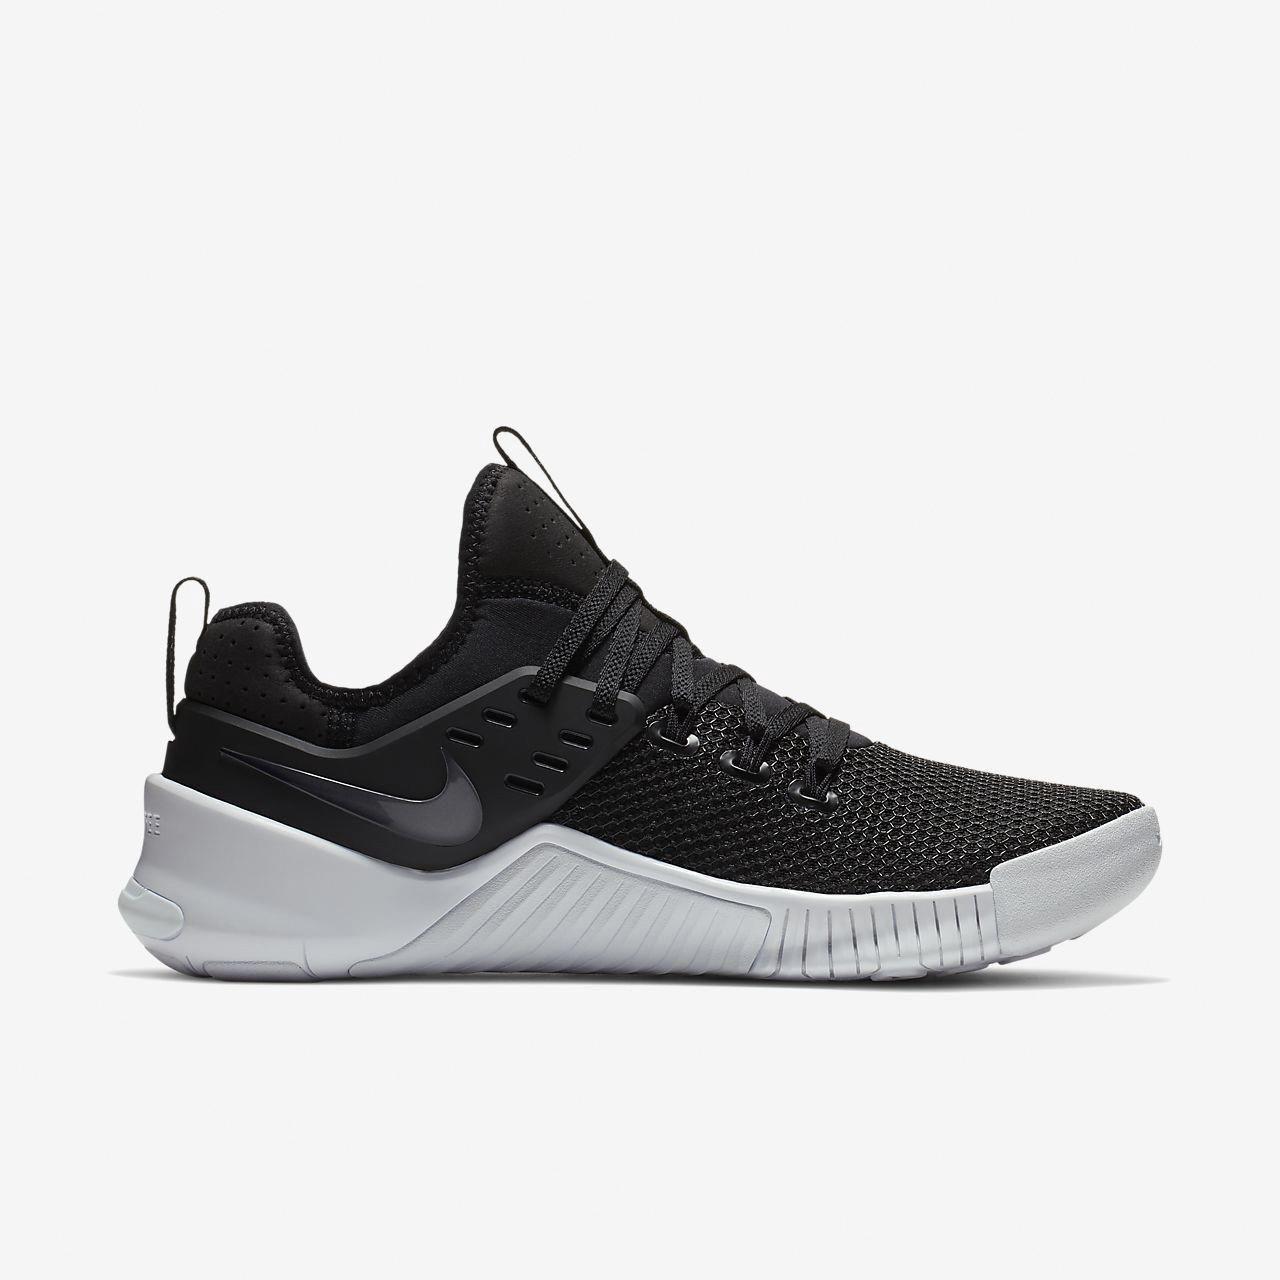 finest selection ea6f5 53c50 Nike Free X Metcon Men S Training Shoe - M 10   W 11.5   basketballstrengthtraining